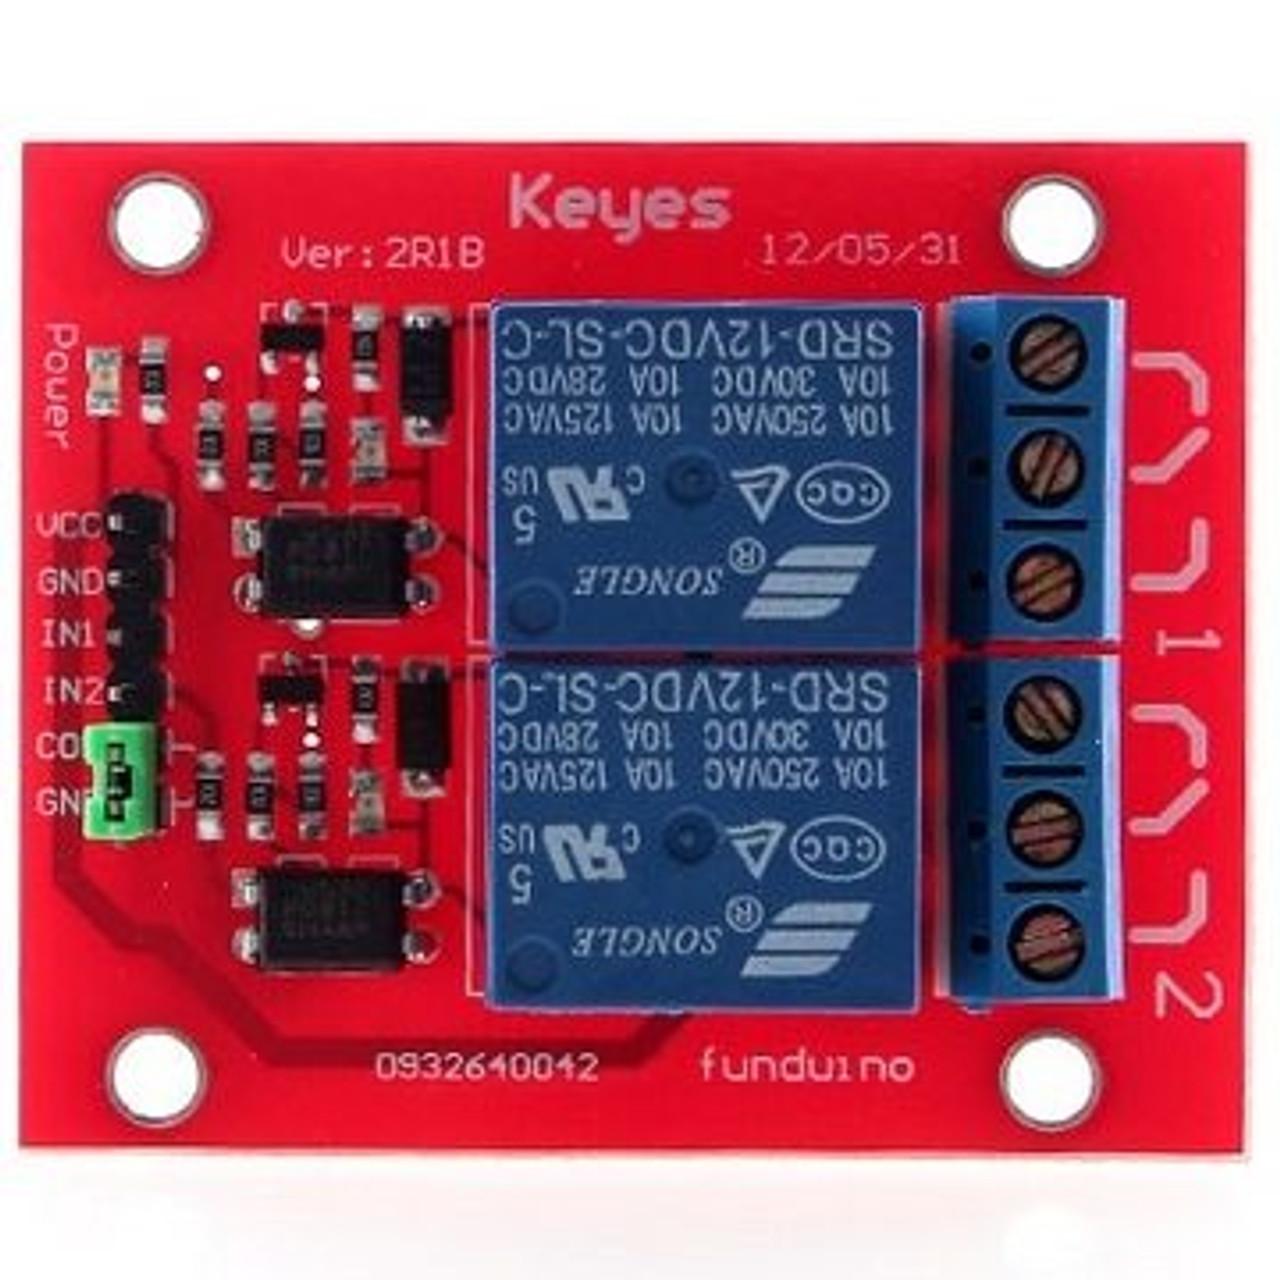 2-Channel Relay Module for Arduino & Raspberry Pi - 12V (Keyes)